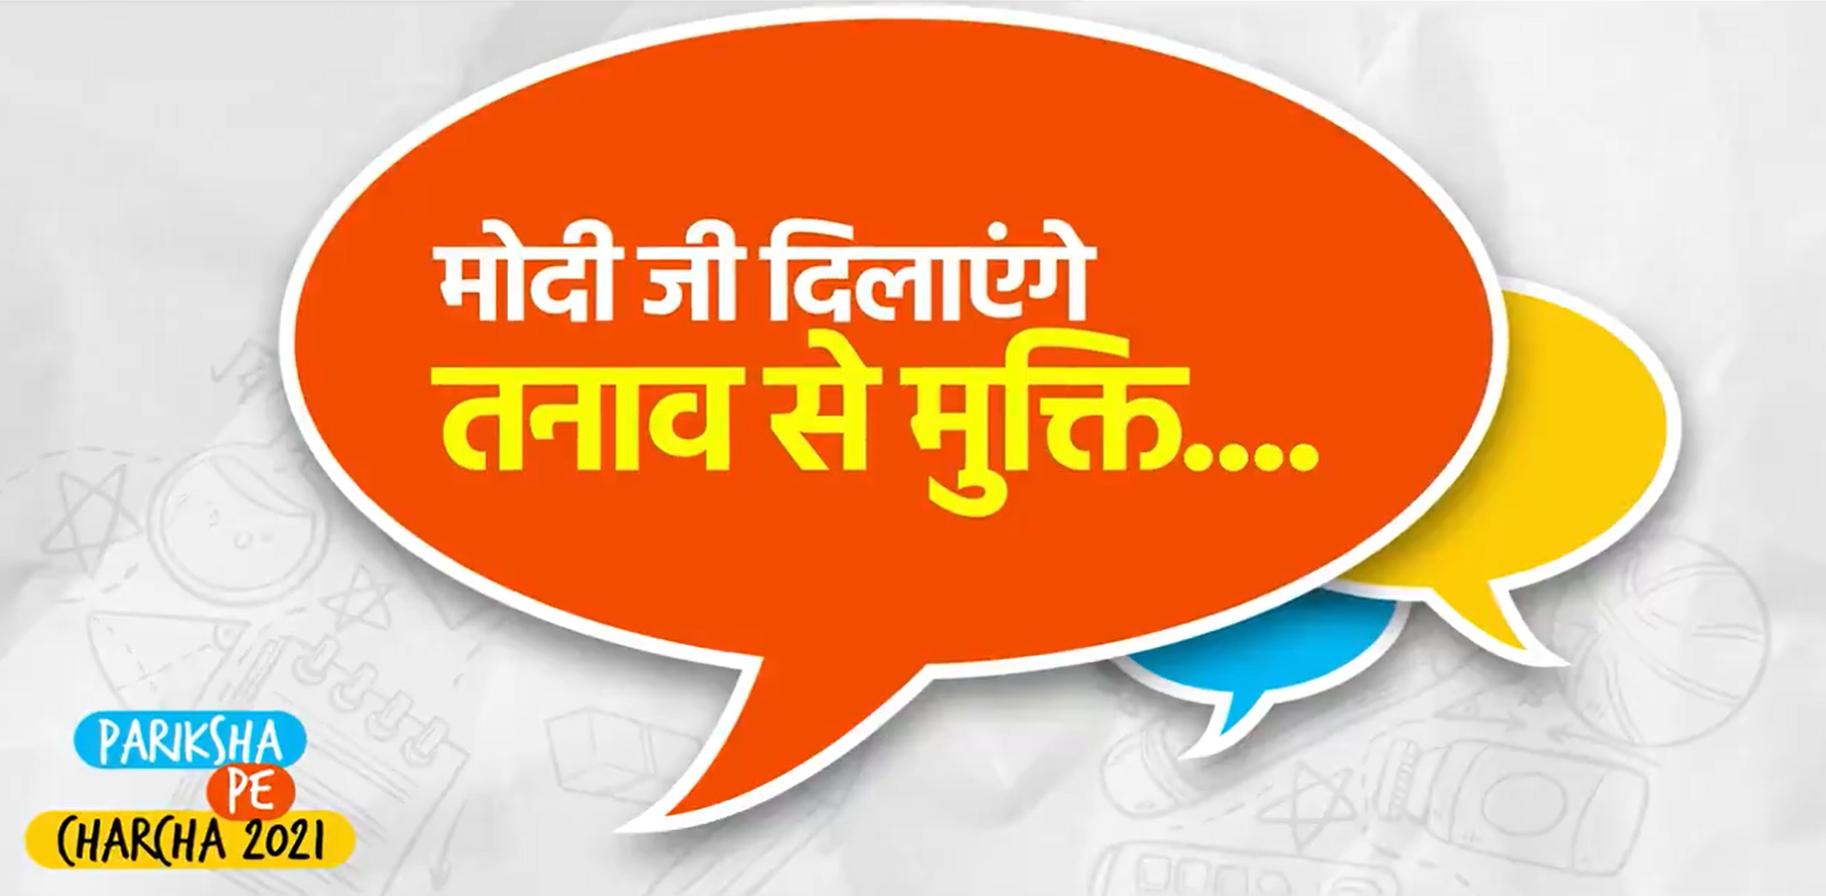 Pariksha Pe Charcha 2021: PM Modi Mantras for Students_90.1